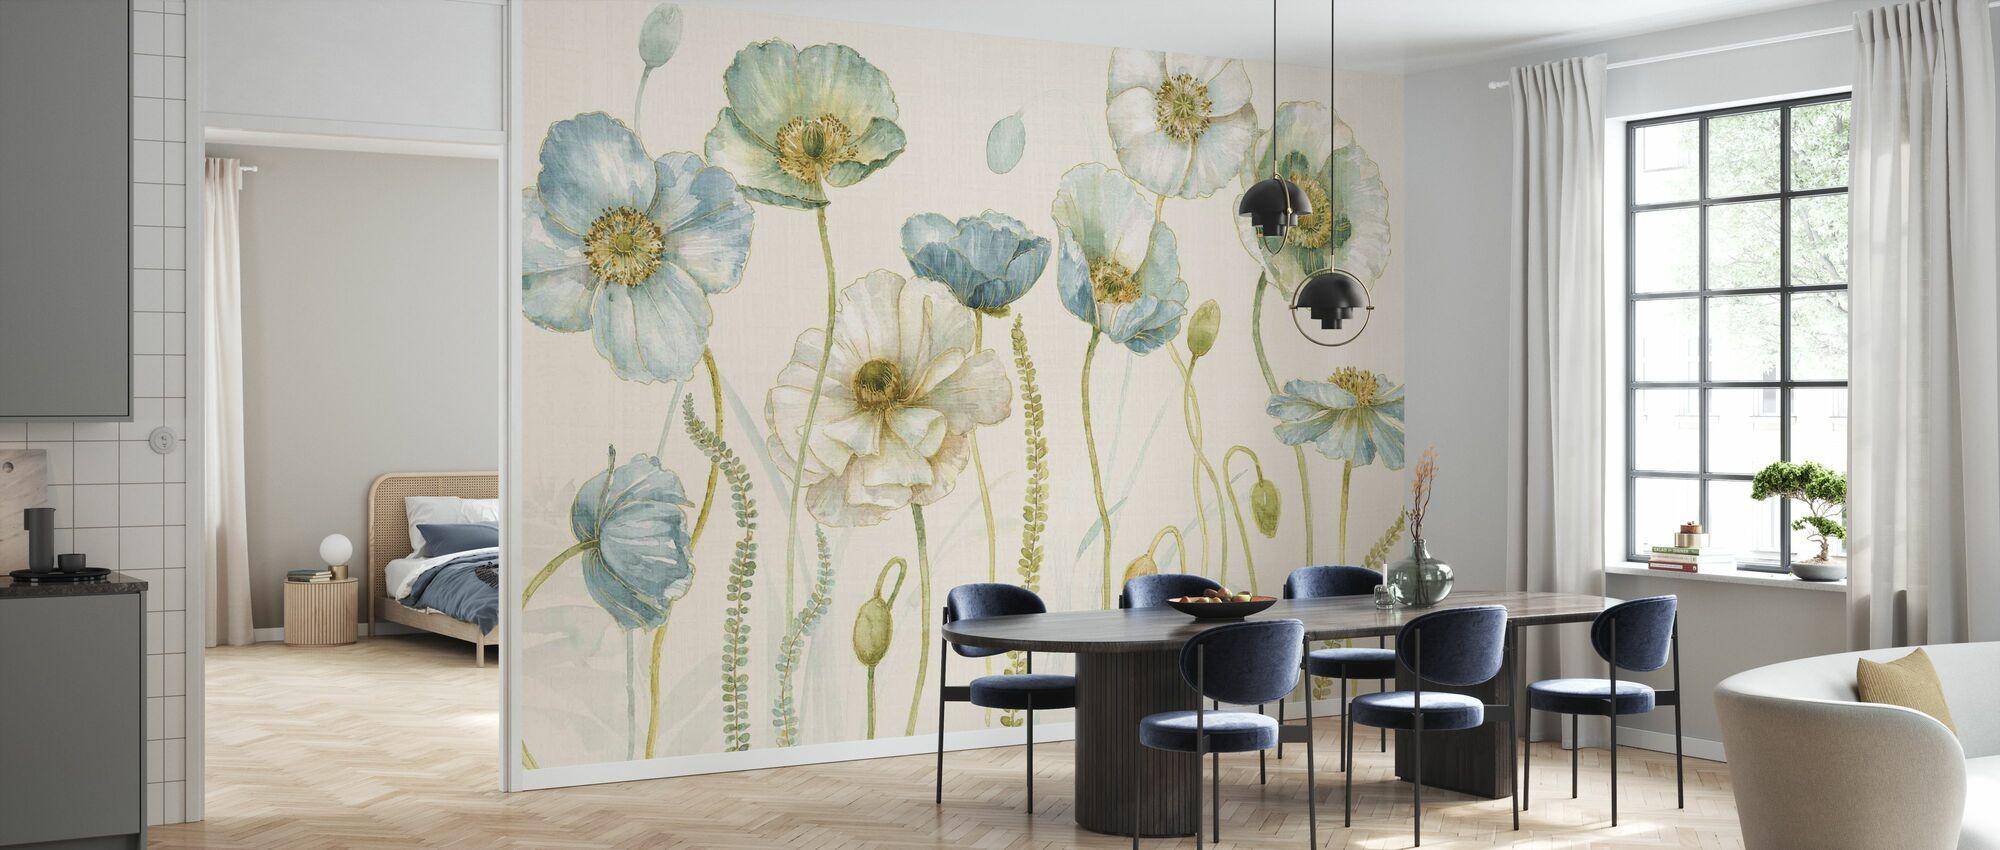 My Greenhouse Flowers on Linen - Cream - Wallpaper - Kitchen